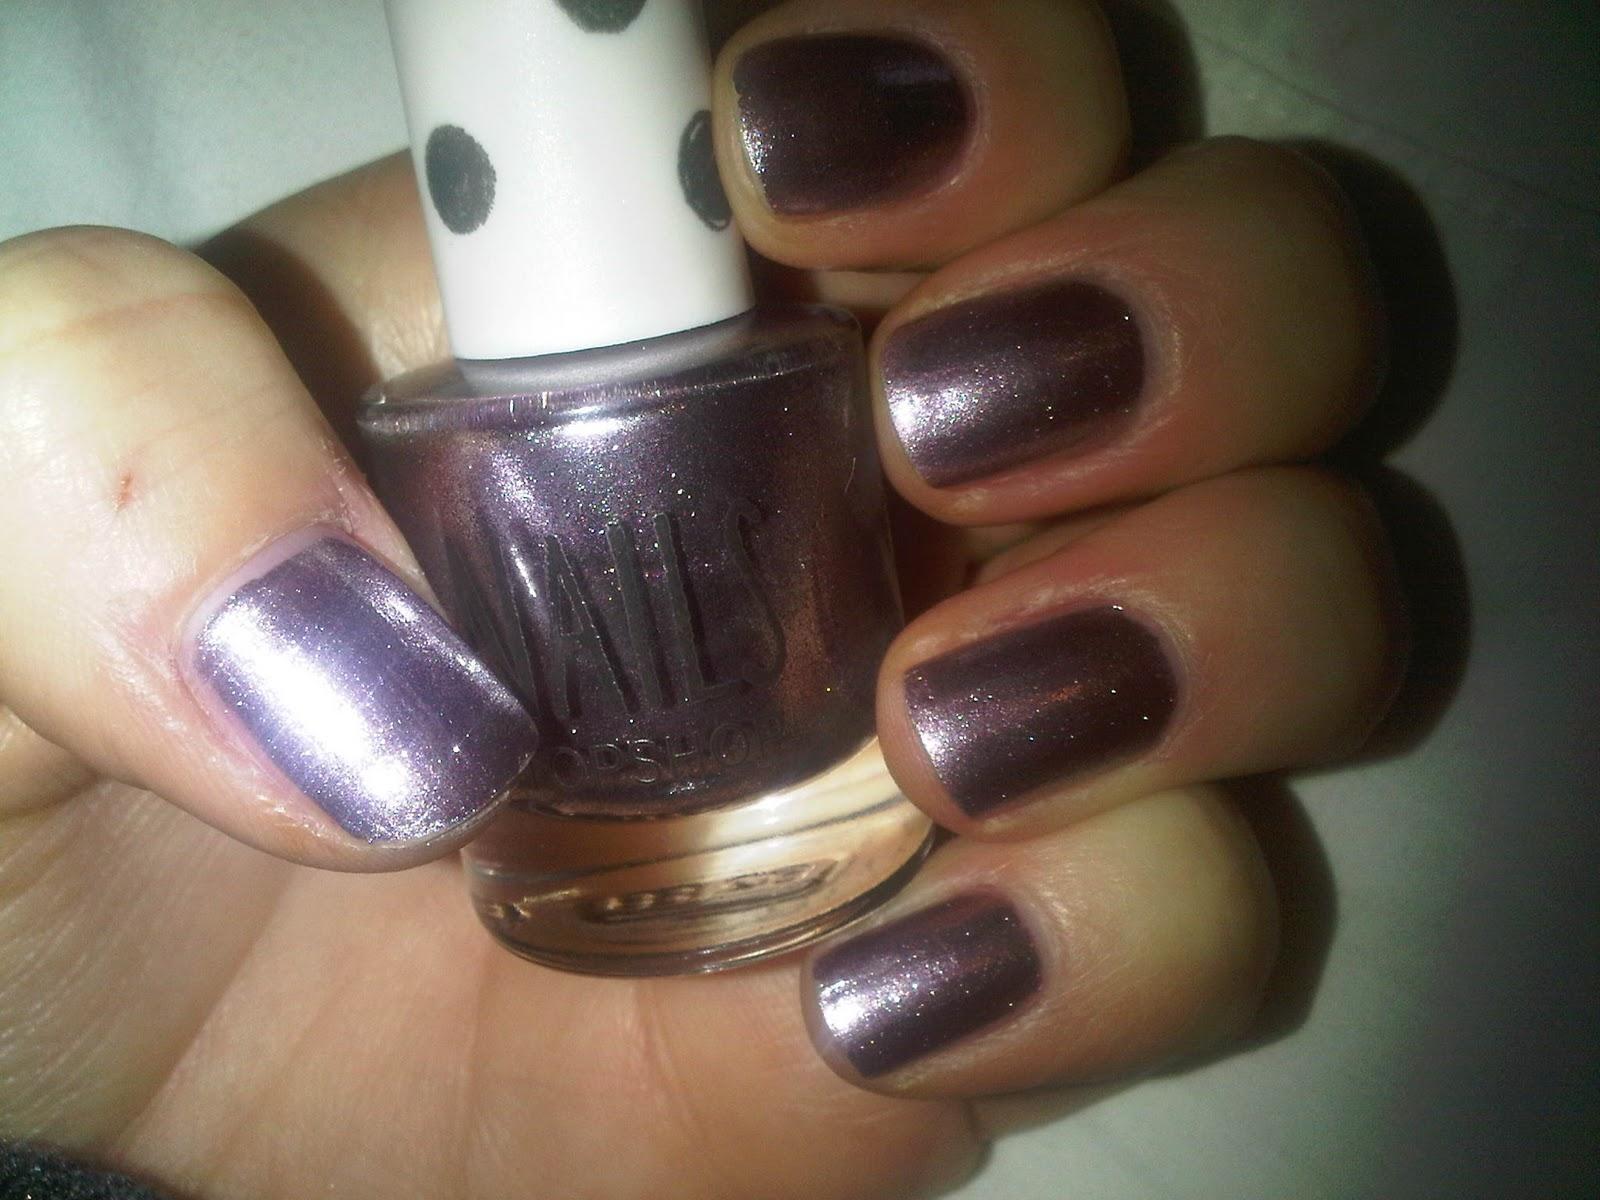 Beauty Magpie: Festive nails